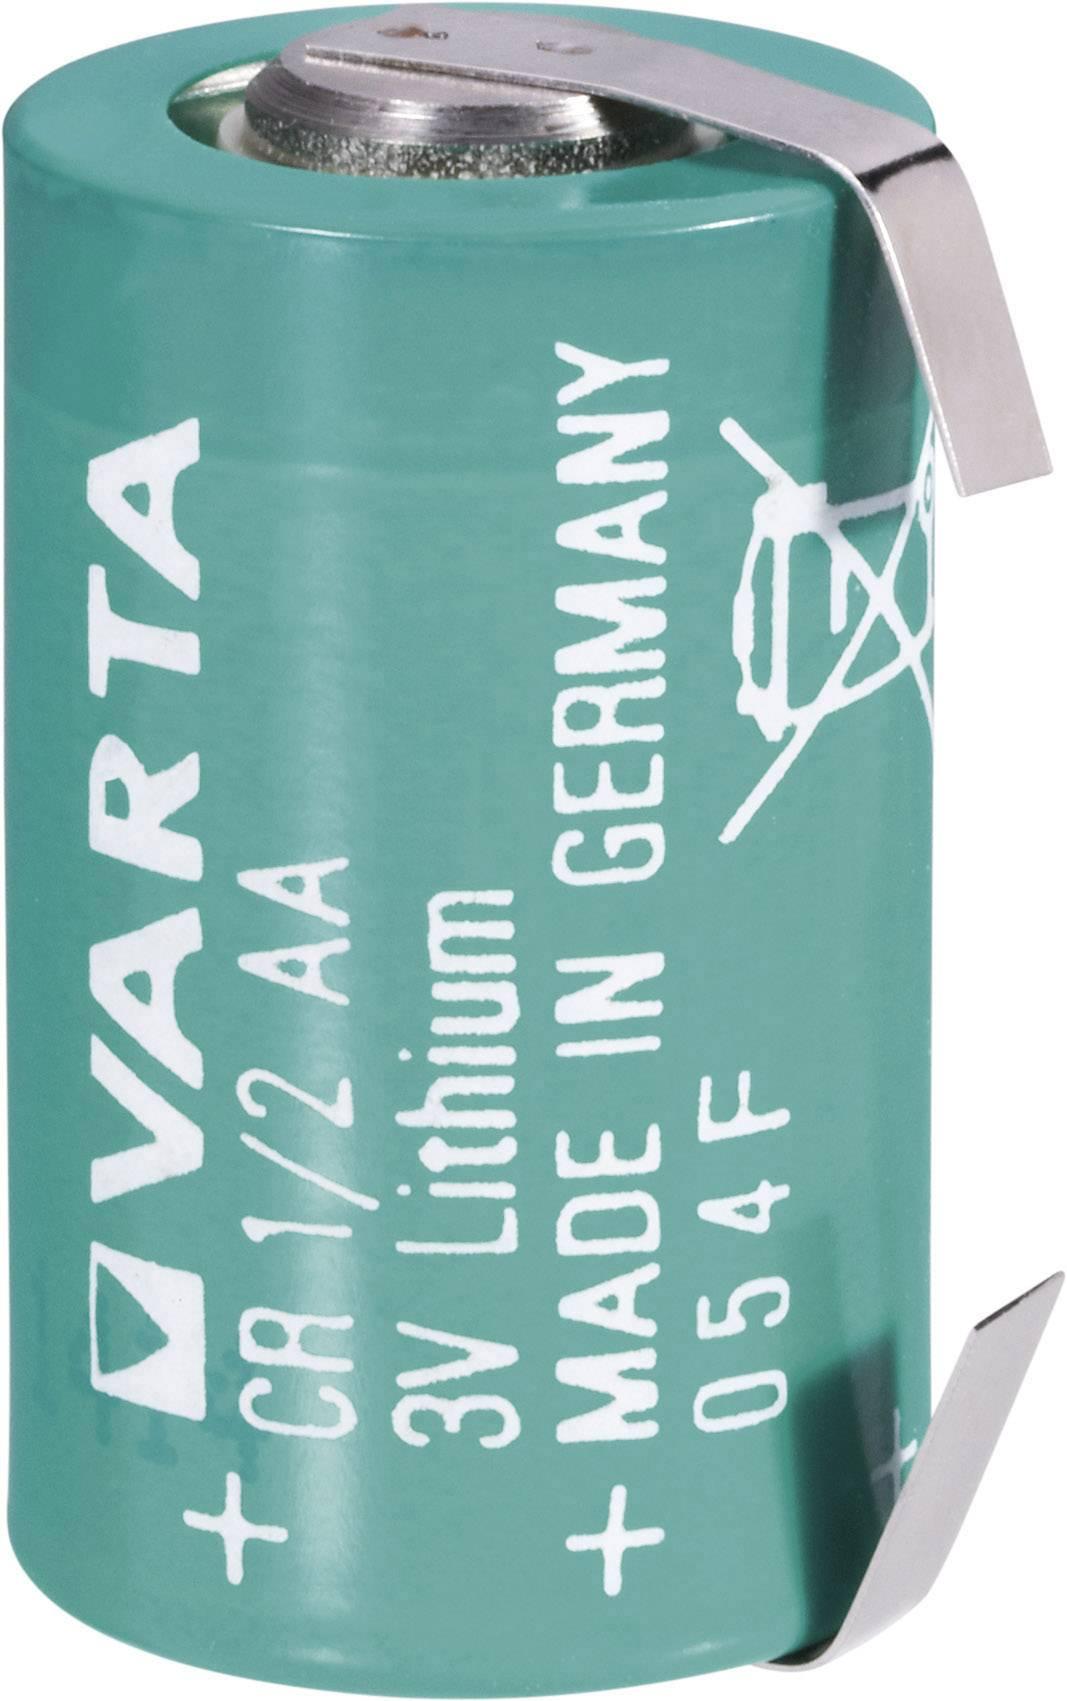 Špeciálny typ batérie CR 1/2 AA LF lítium, Varta CR1/2 AA LF, 970 mAh, 3 V, 1 ks